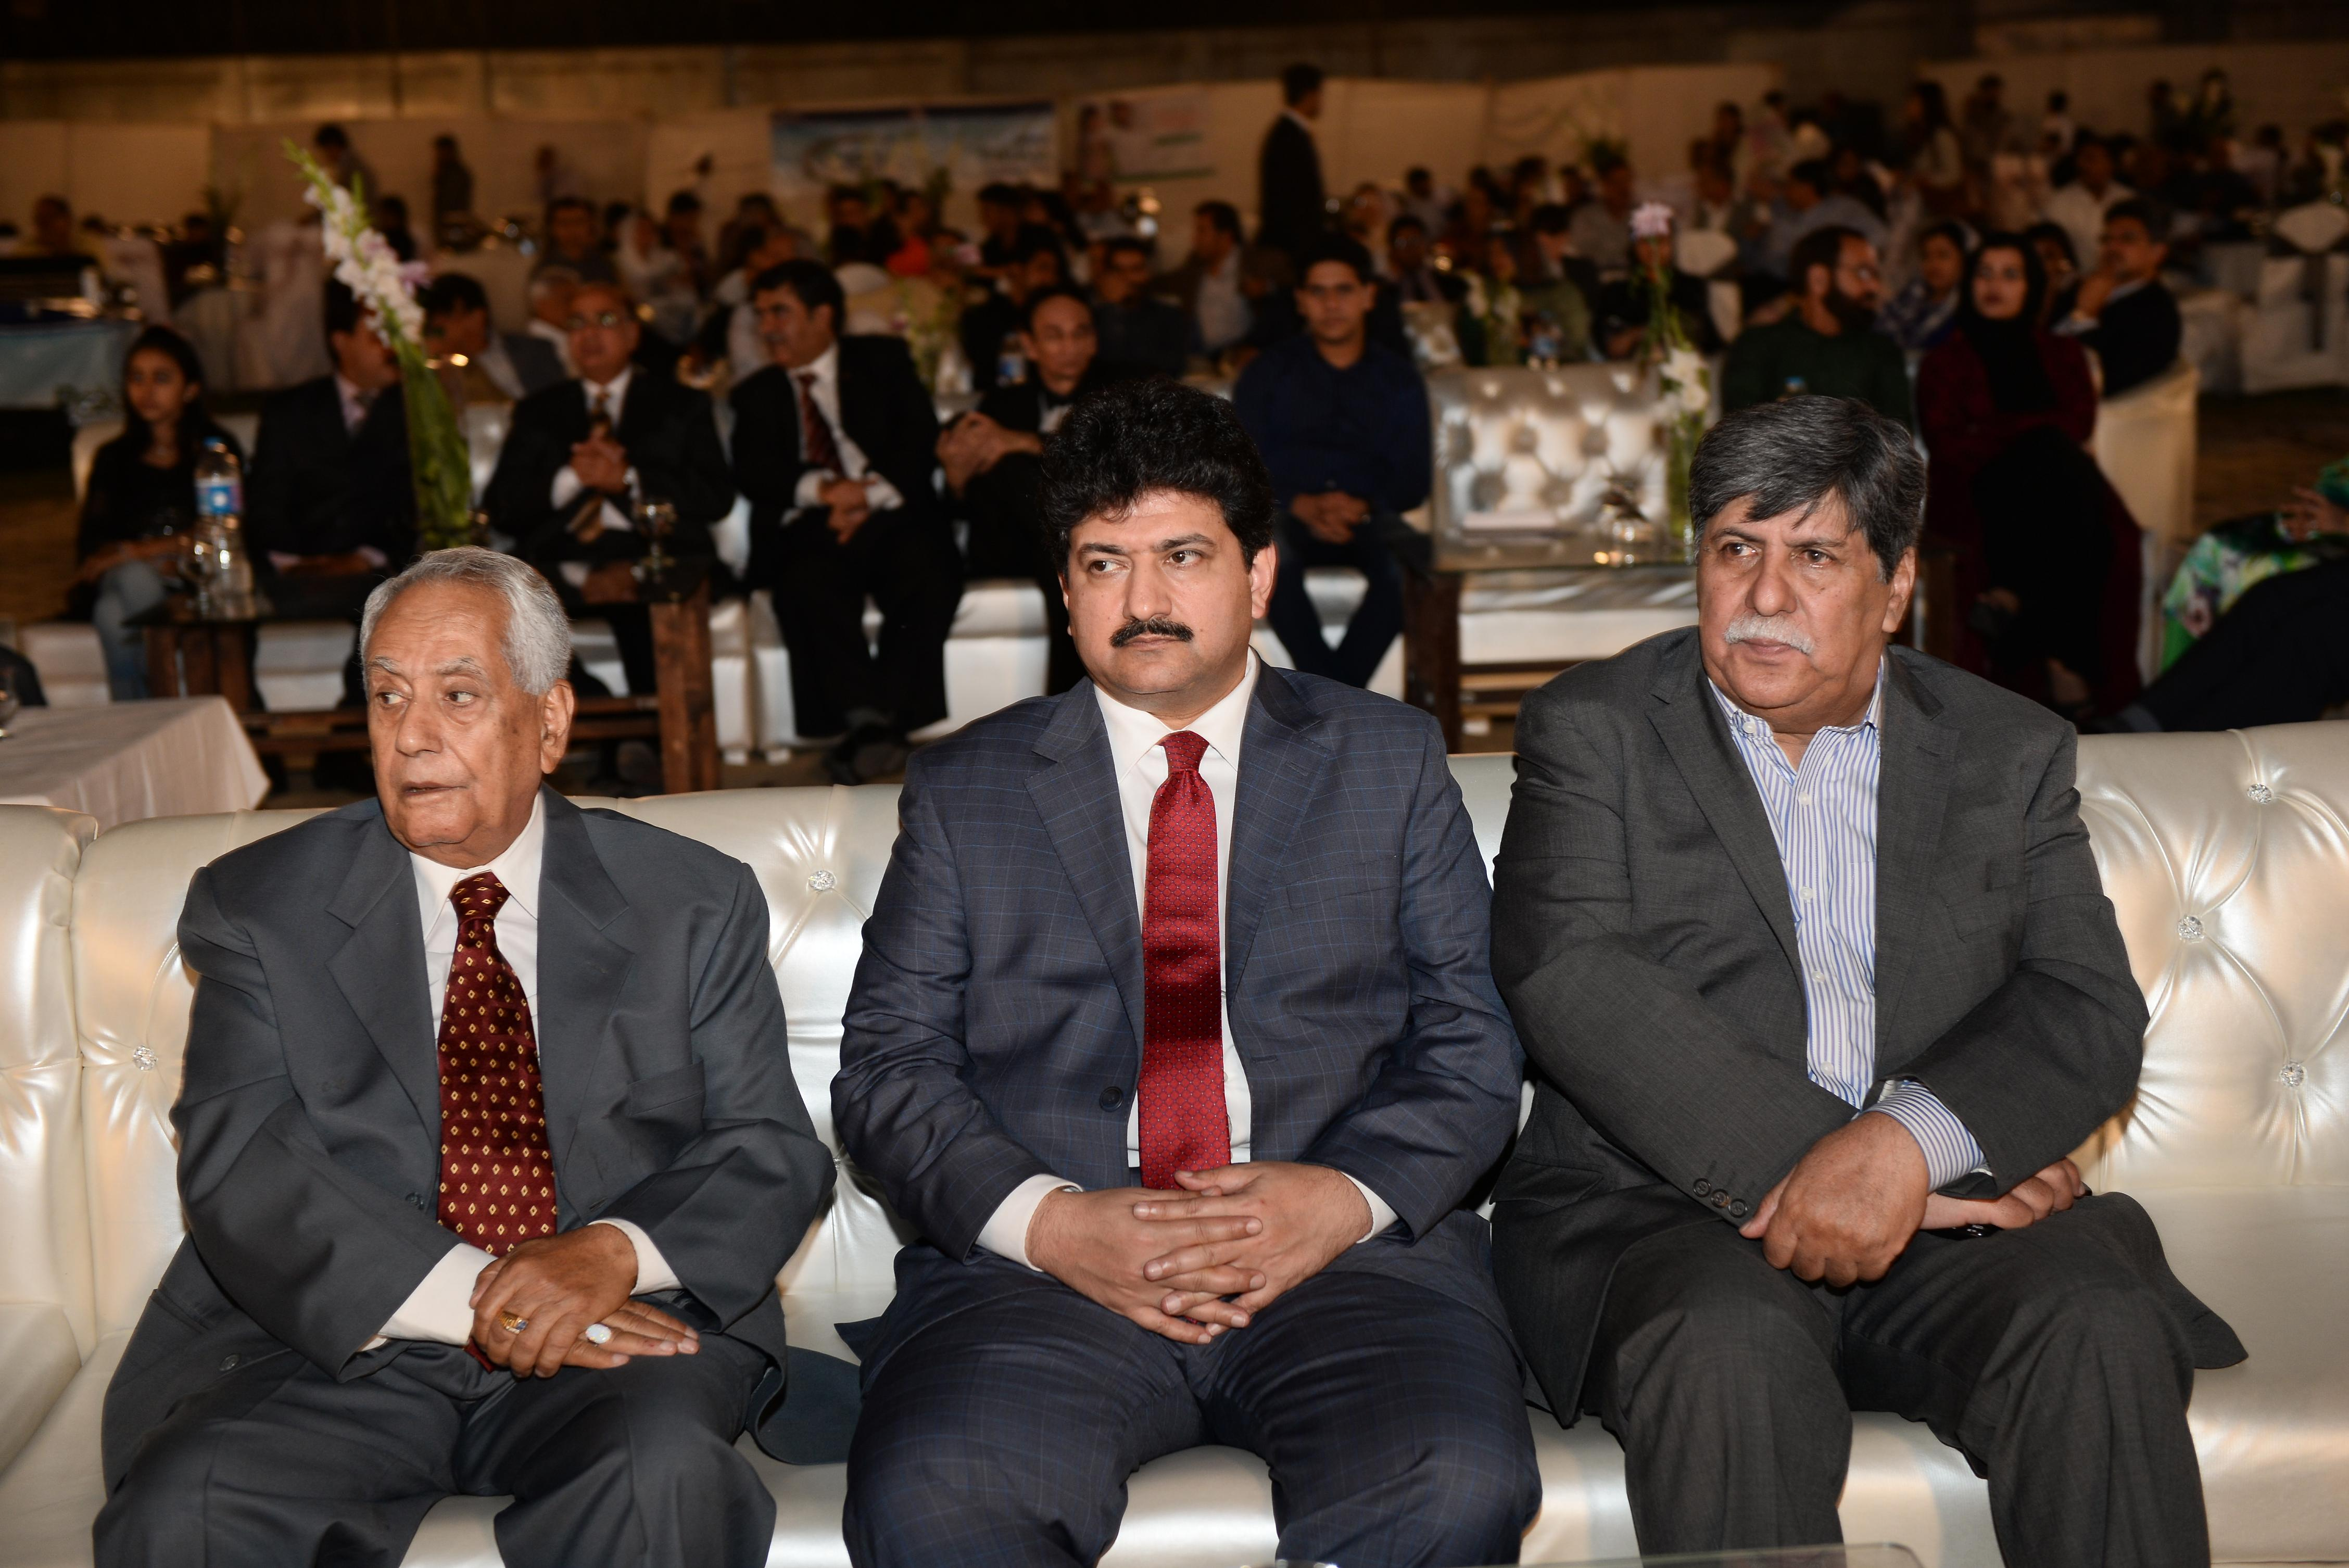 Mr. Hamid Mir, Asghar Nadeem Syed